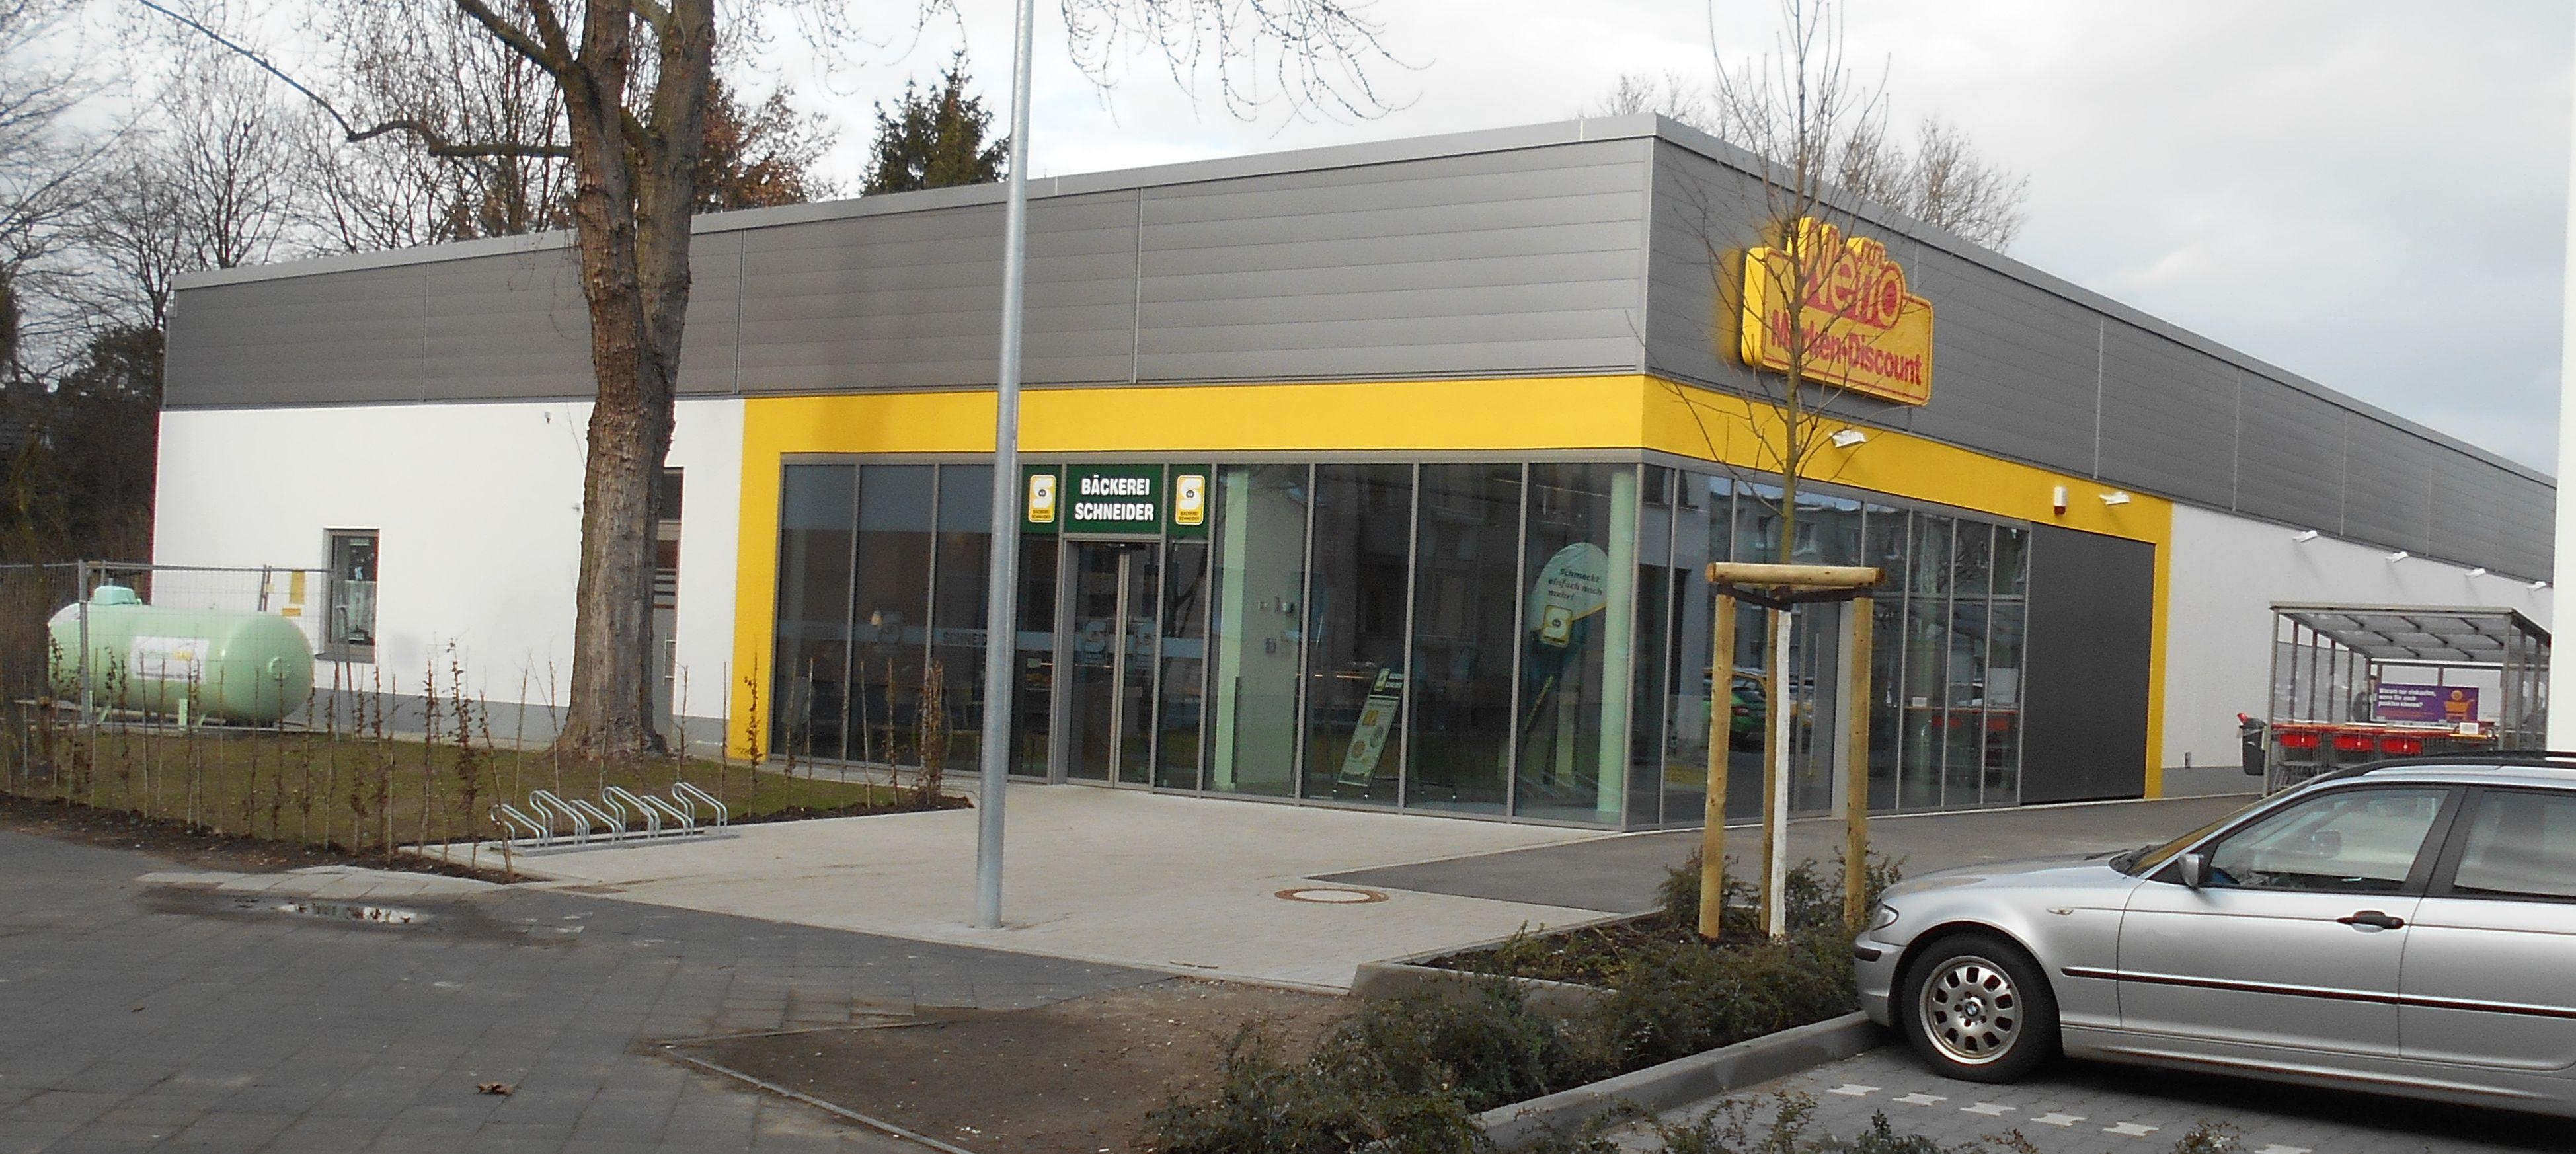 Gebr. Rossenbach GmbH